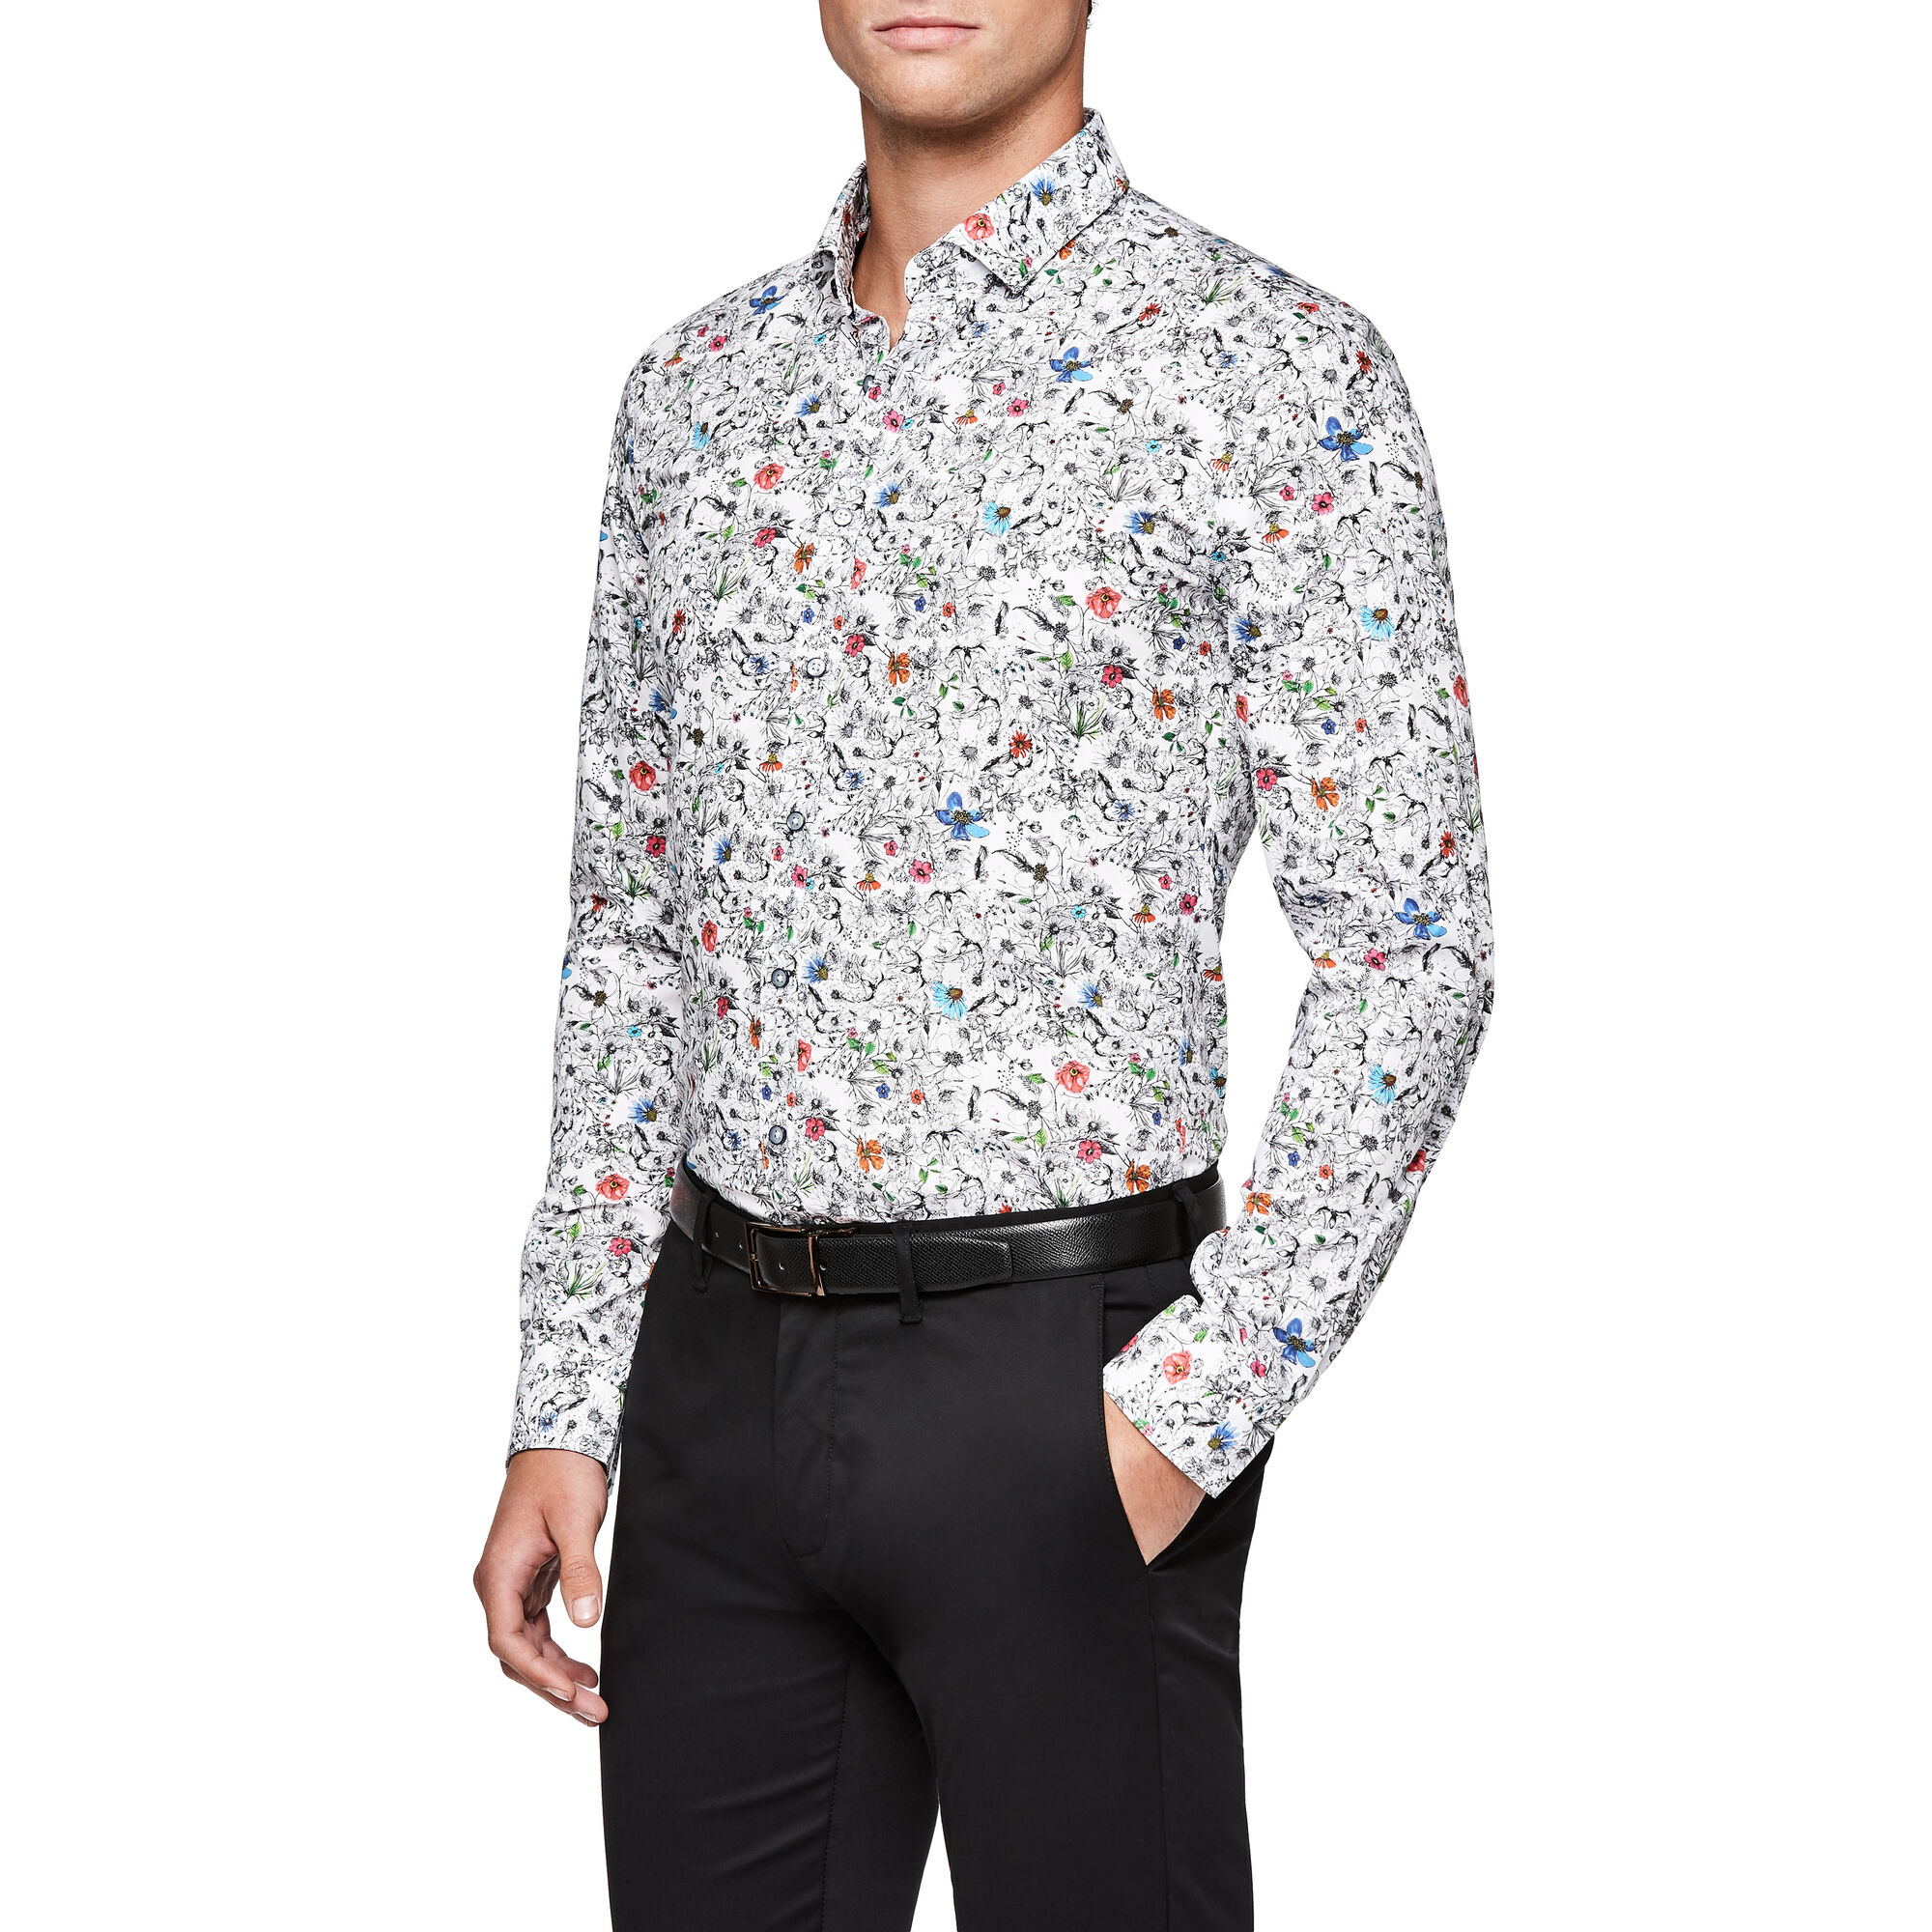 6a0c2d5dbdeb90 Collin - Multi Floral - L/S Italian Fabric Floral Shirt | Politix